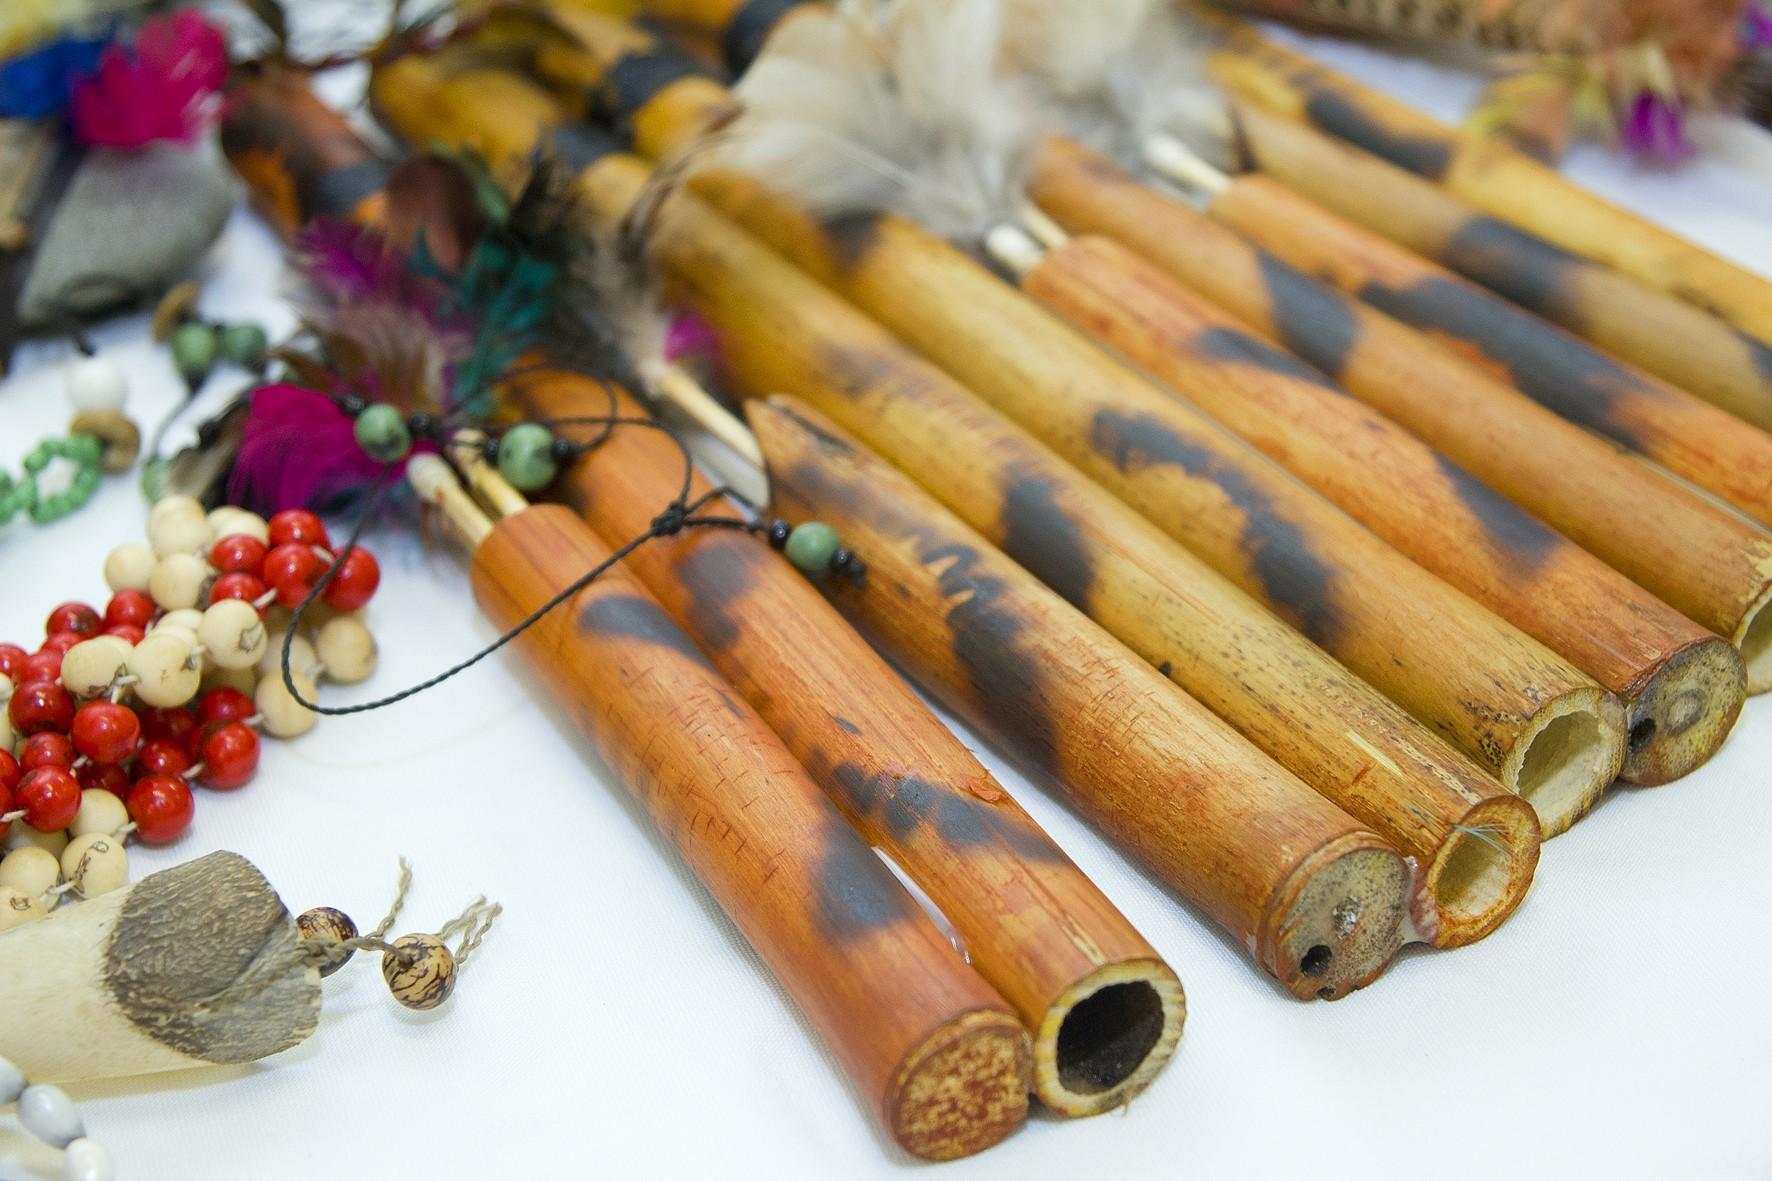 Artesanato Origem Indigena ~ Arte produzida por povos indígenas Foto Marcos Santos